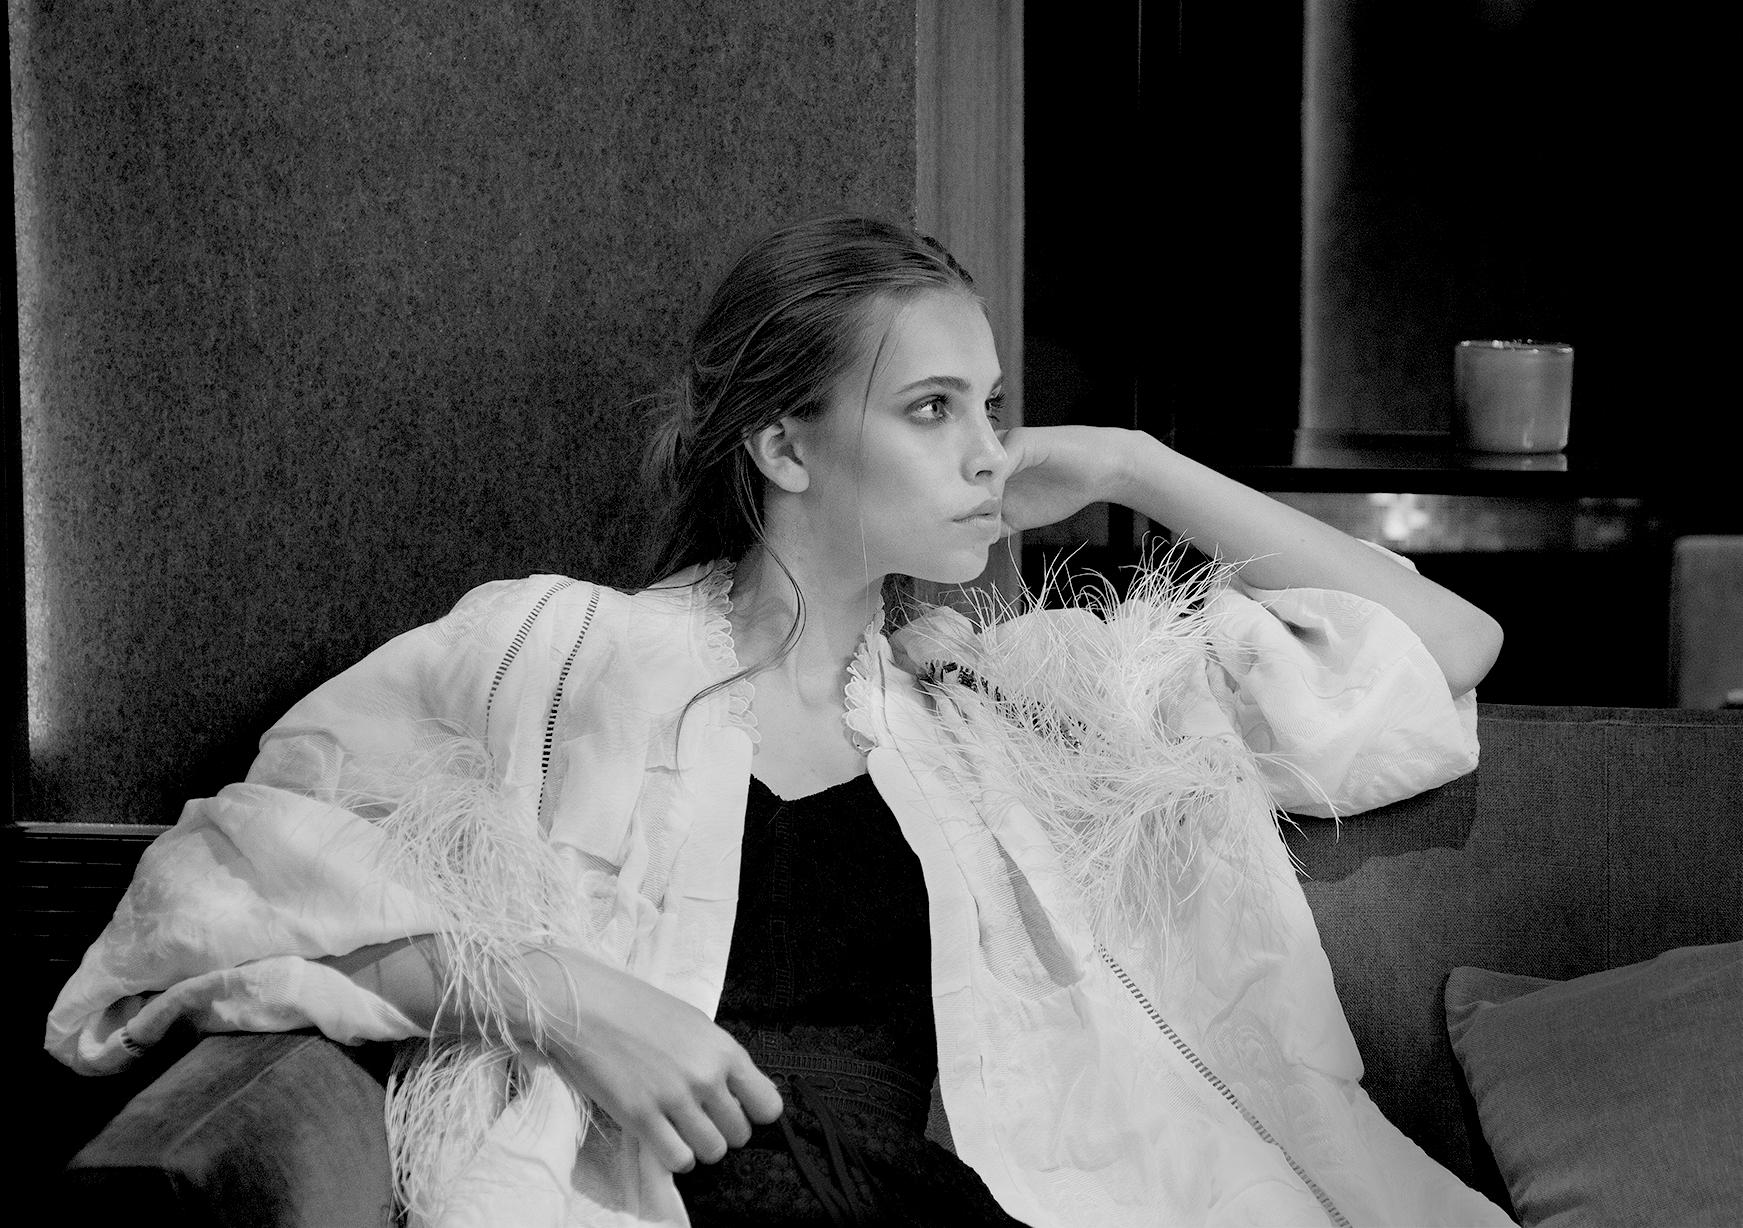 Manteau blanc : KALYAH Robe noir : ALL SAINTS